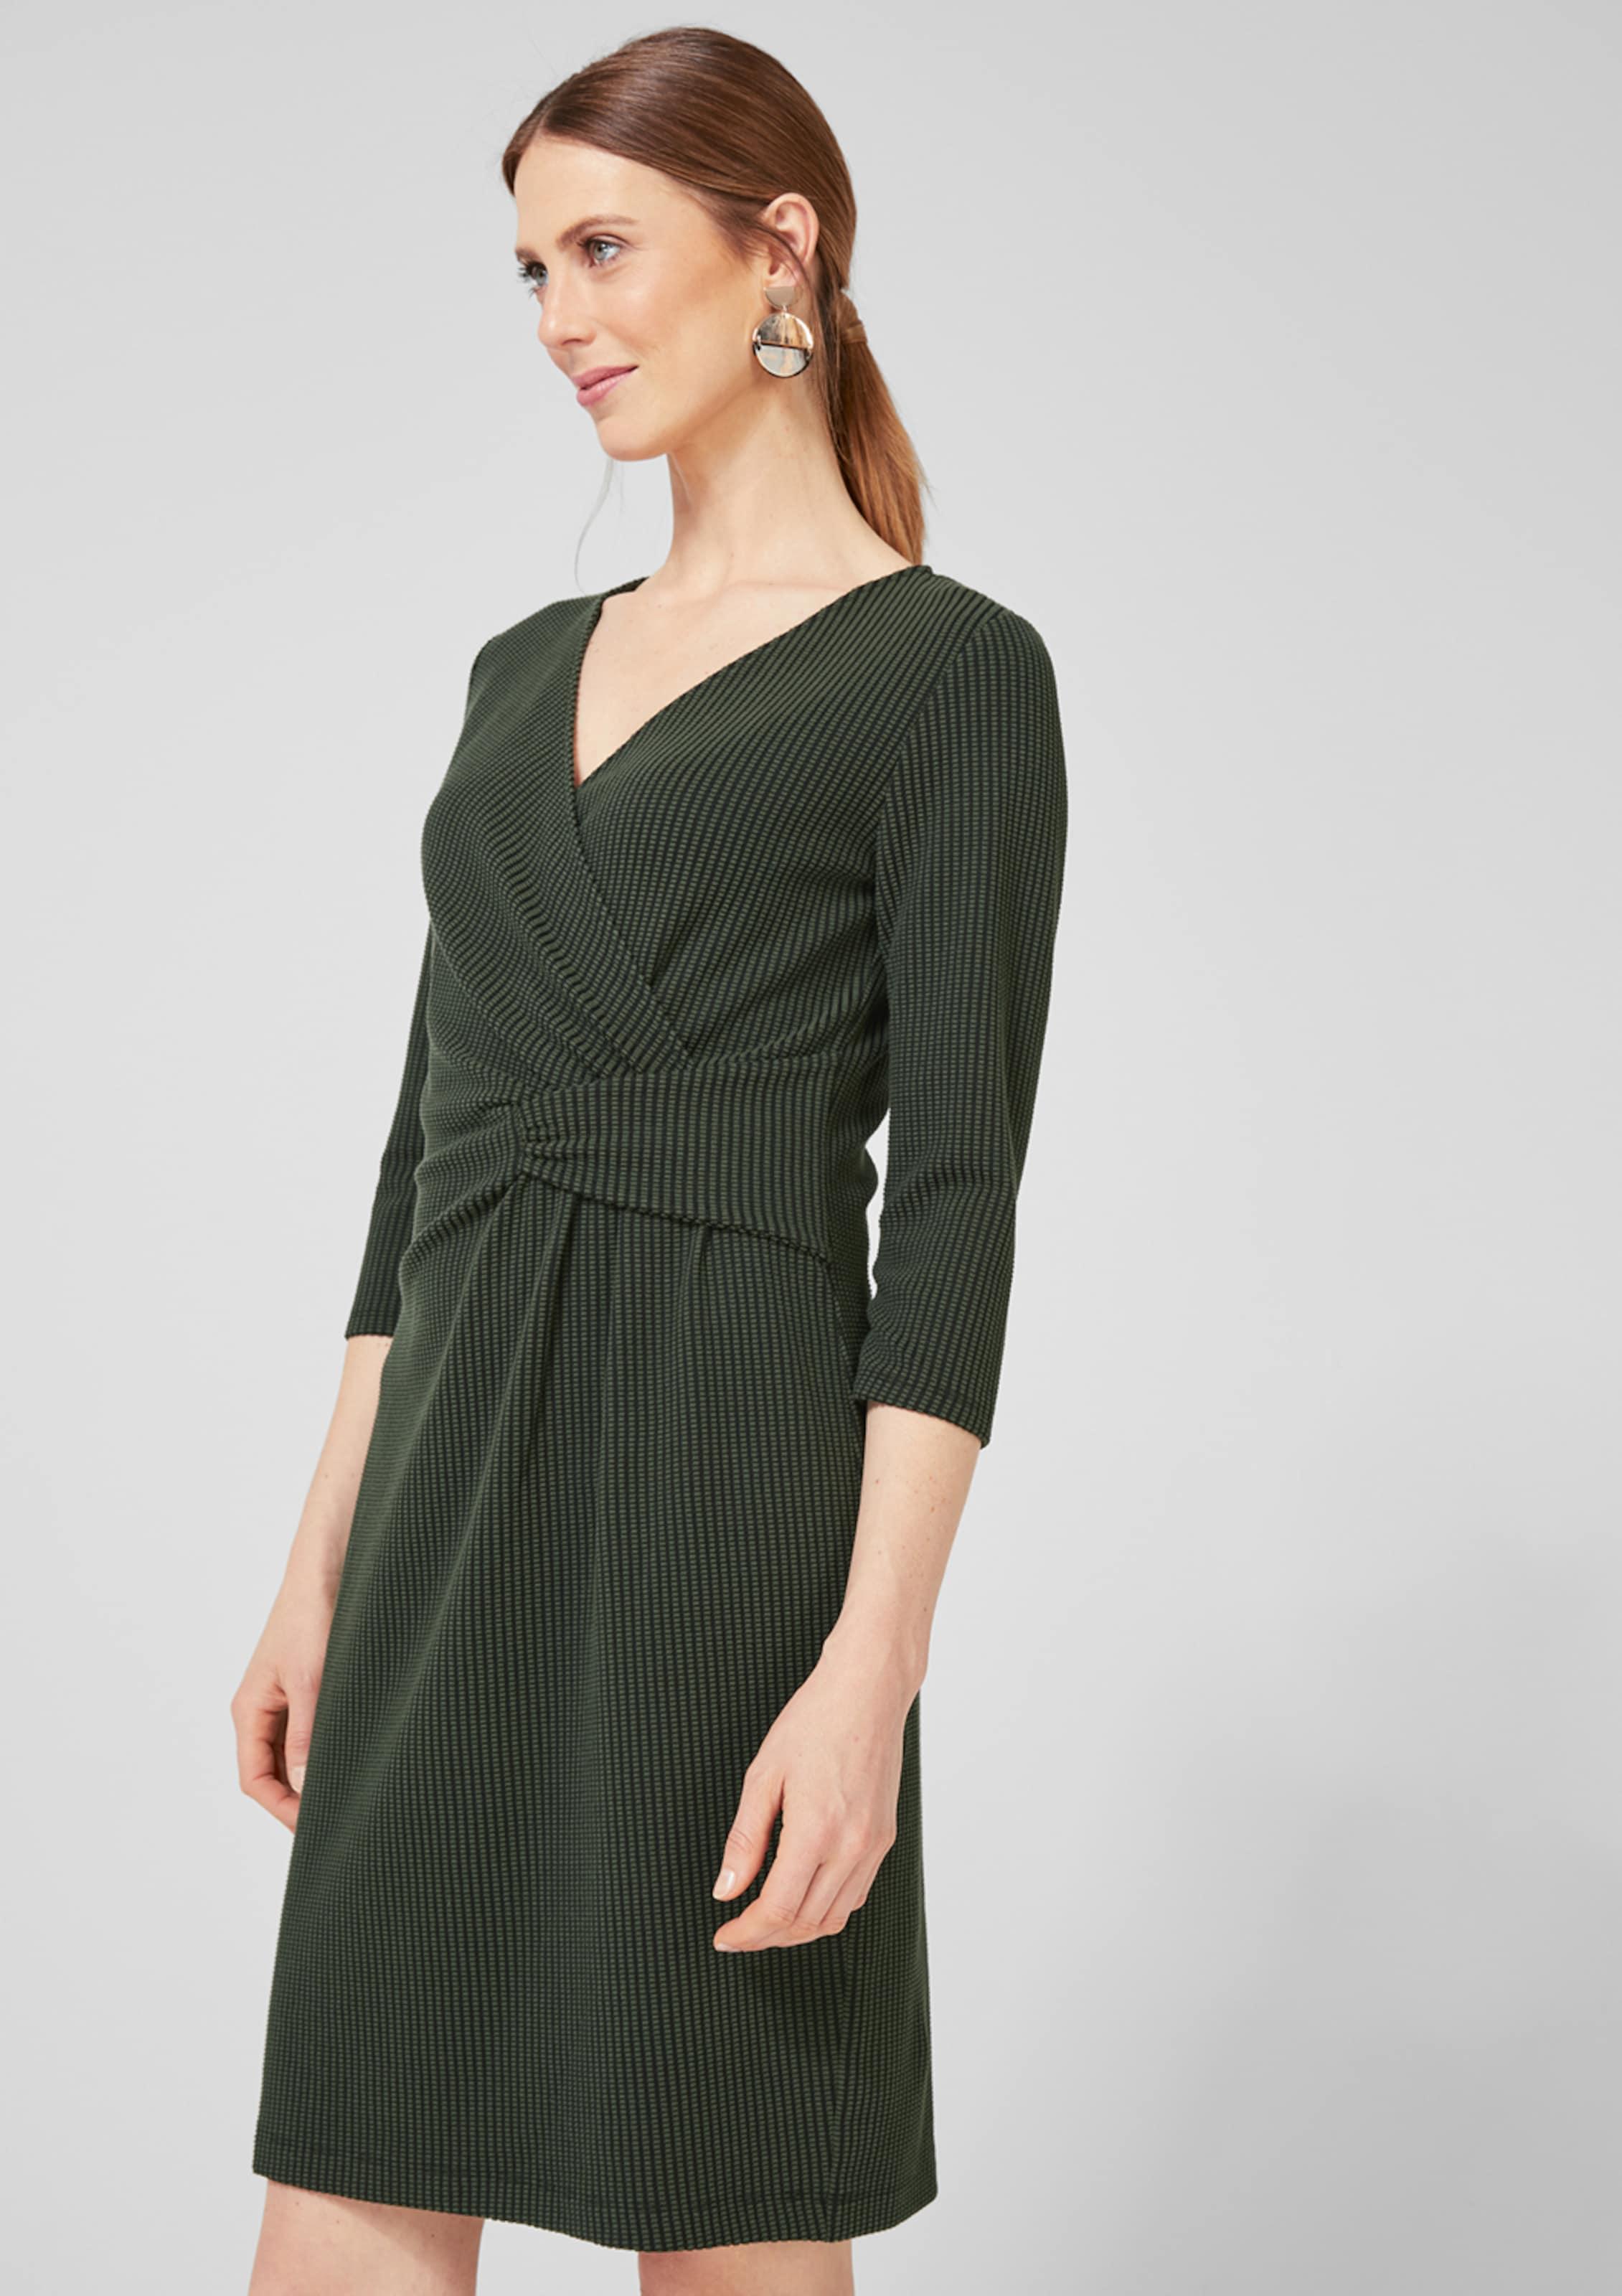 GrünDunkelgrün Label Kleid In S oliver Black rhtdsQC